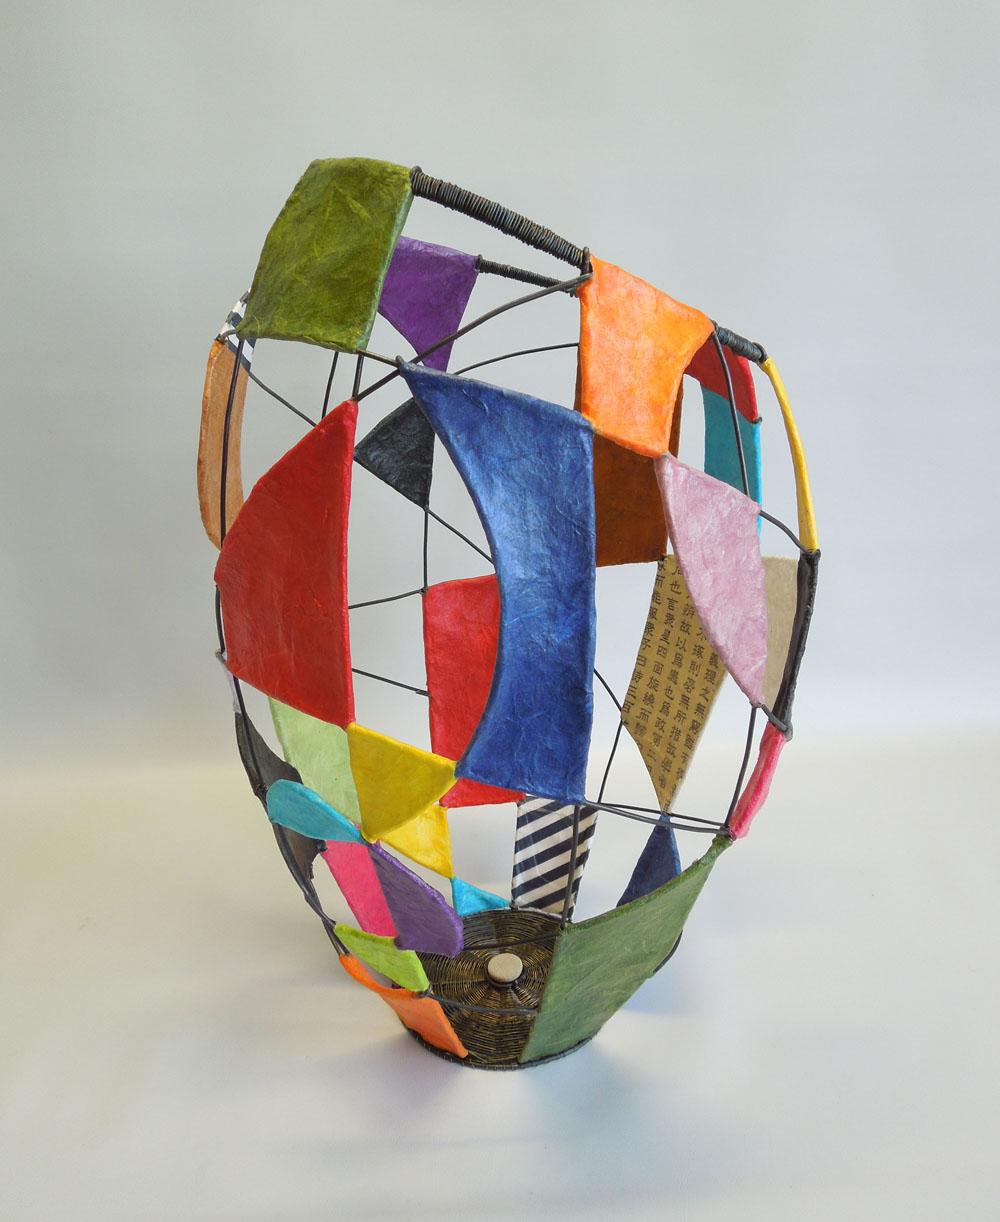 Kaleidoscope Basket- annealed steel, papers